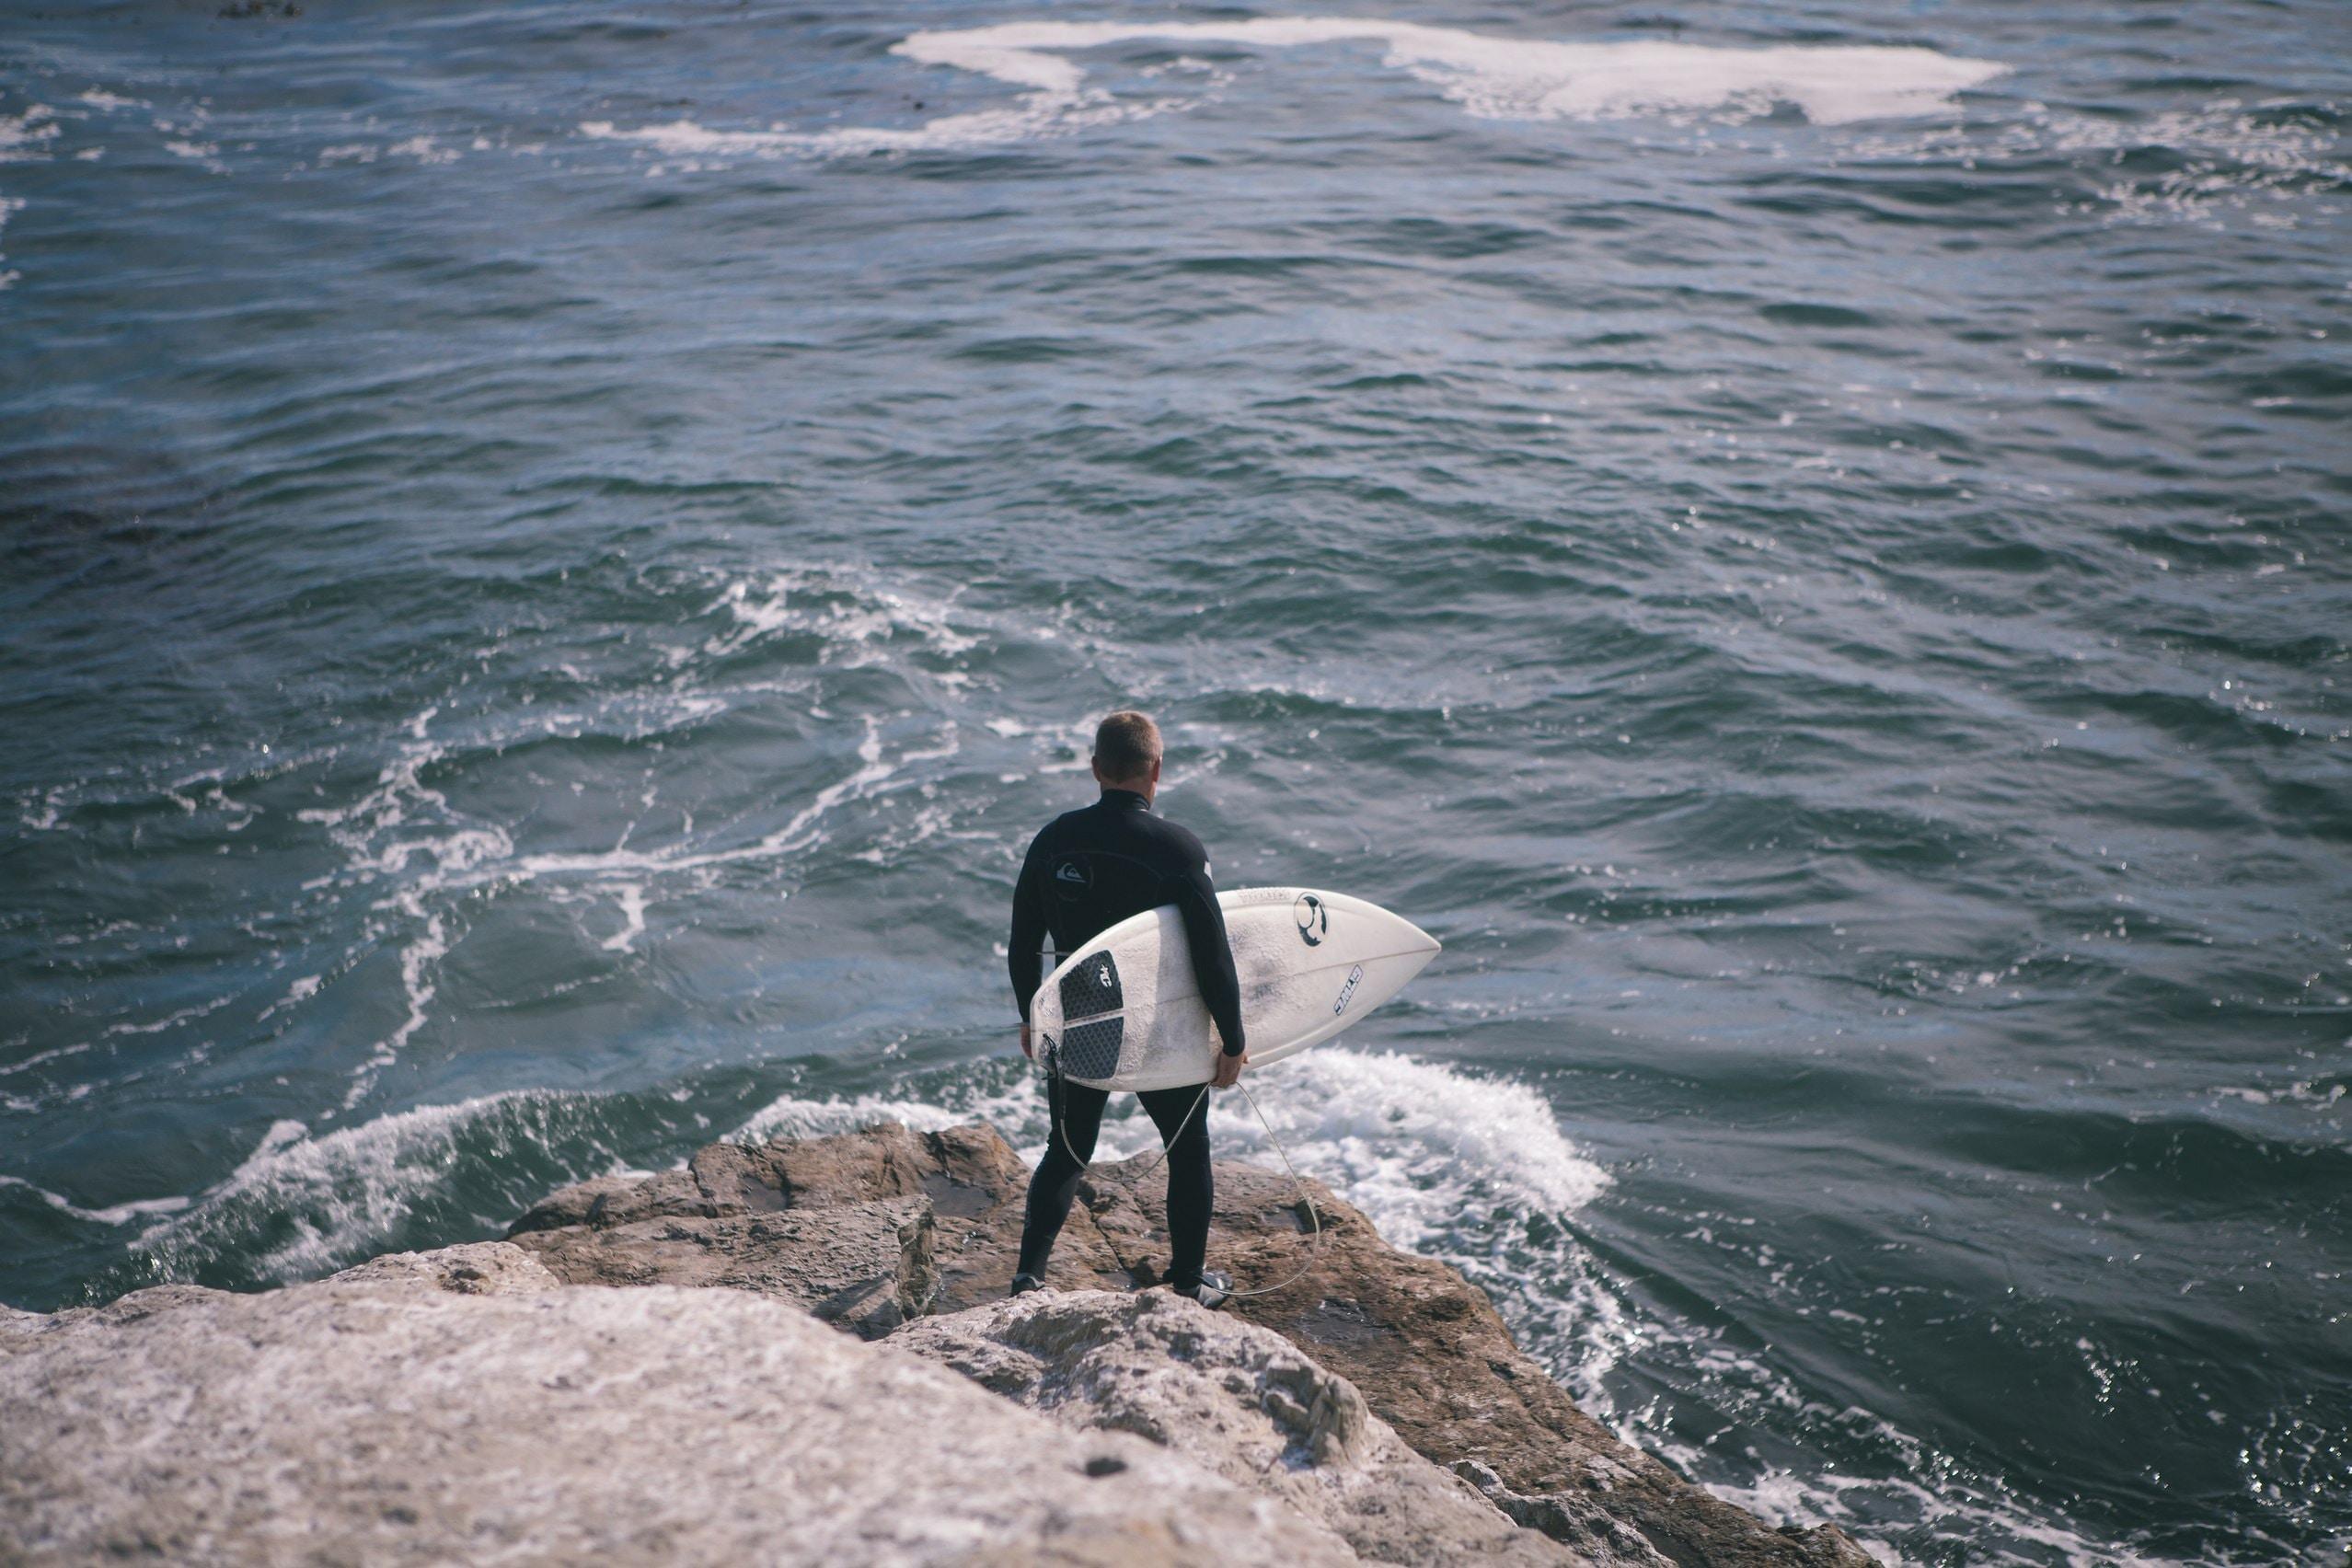 Best-tide-for-surfing